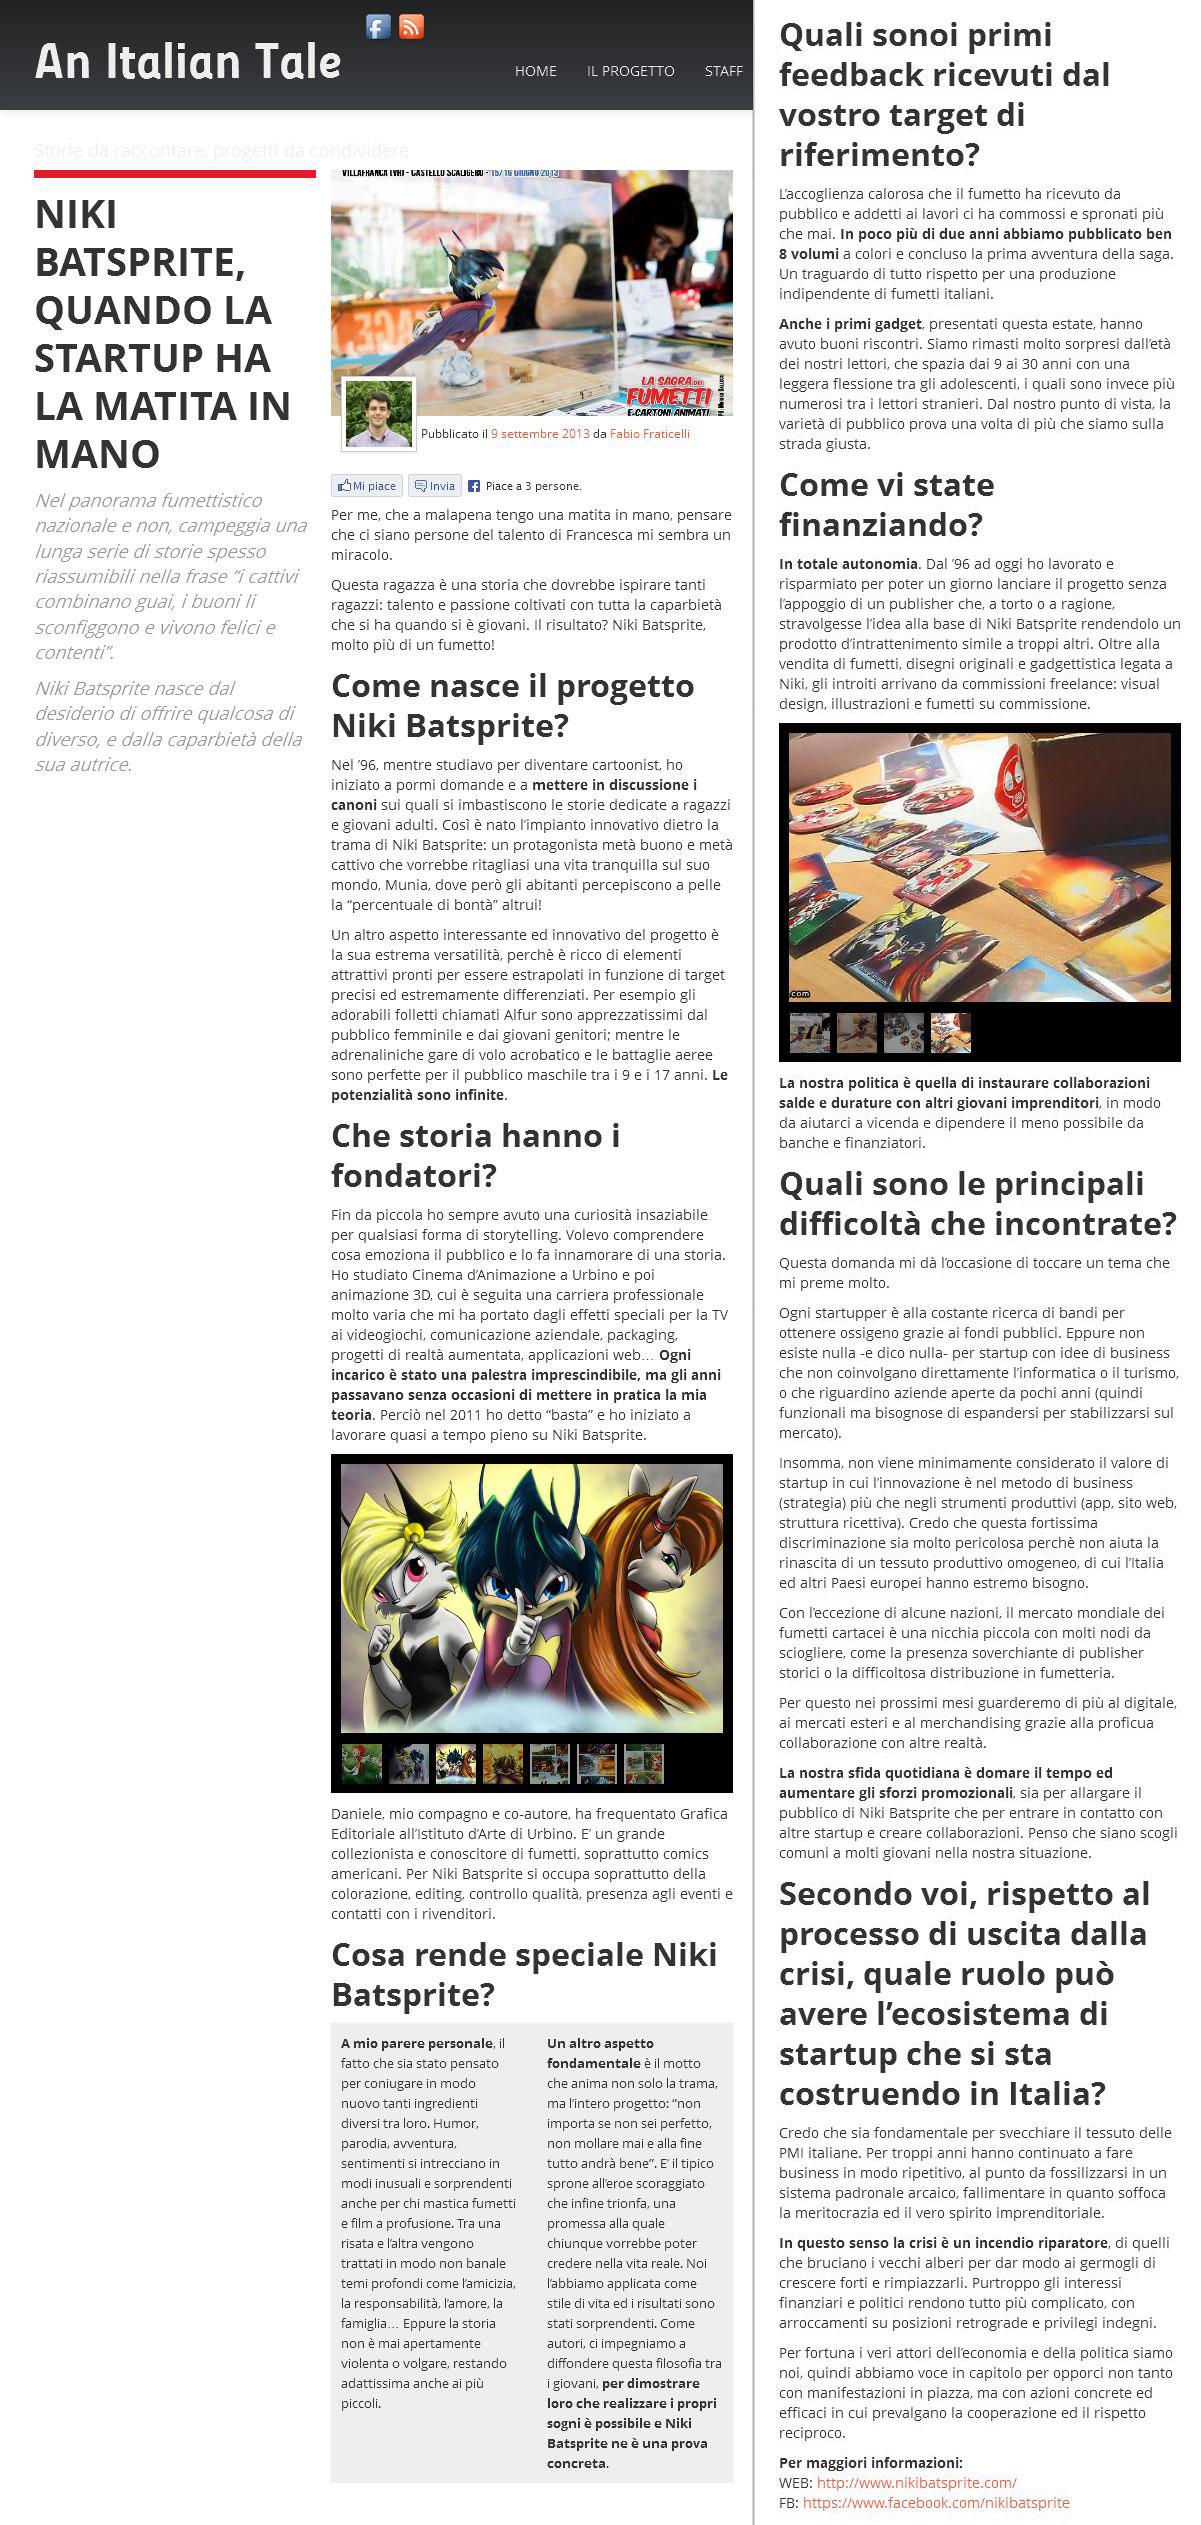 2013-09-09_an_italian_tale_intervista